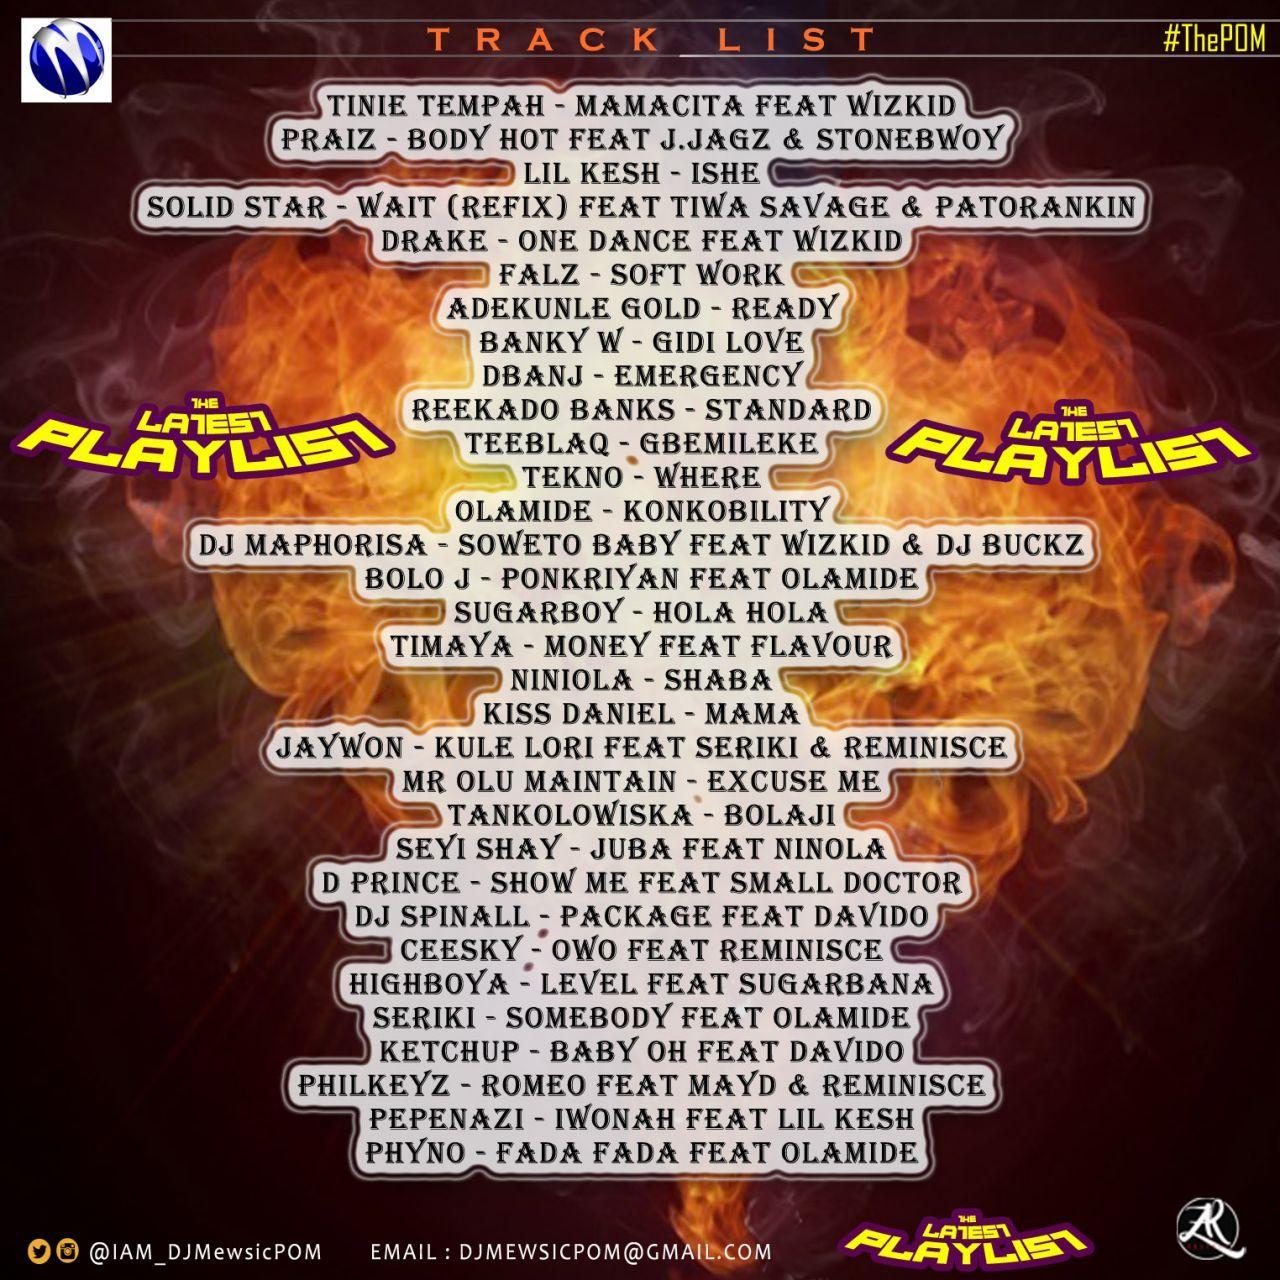 DJ Mewsic - LATEST PLAYLIST (Mixtape) Back Artwork | AceWorldTeam.com